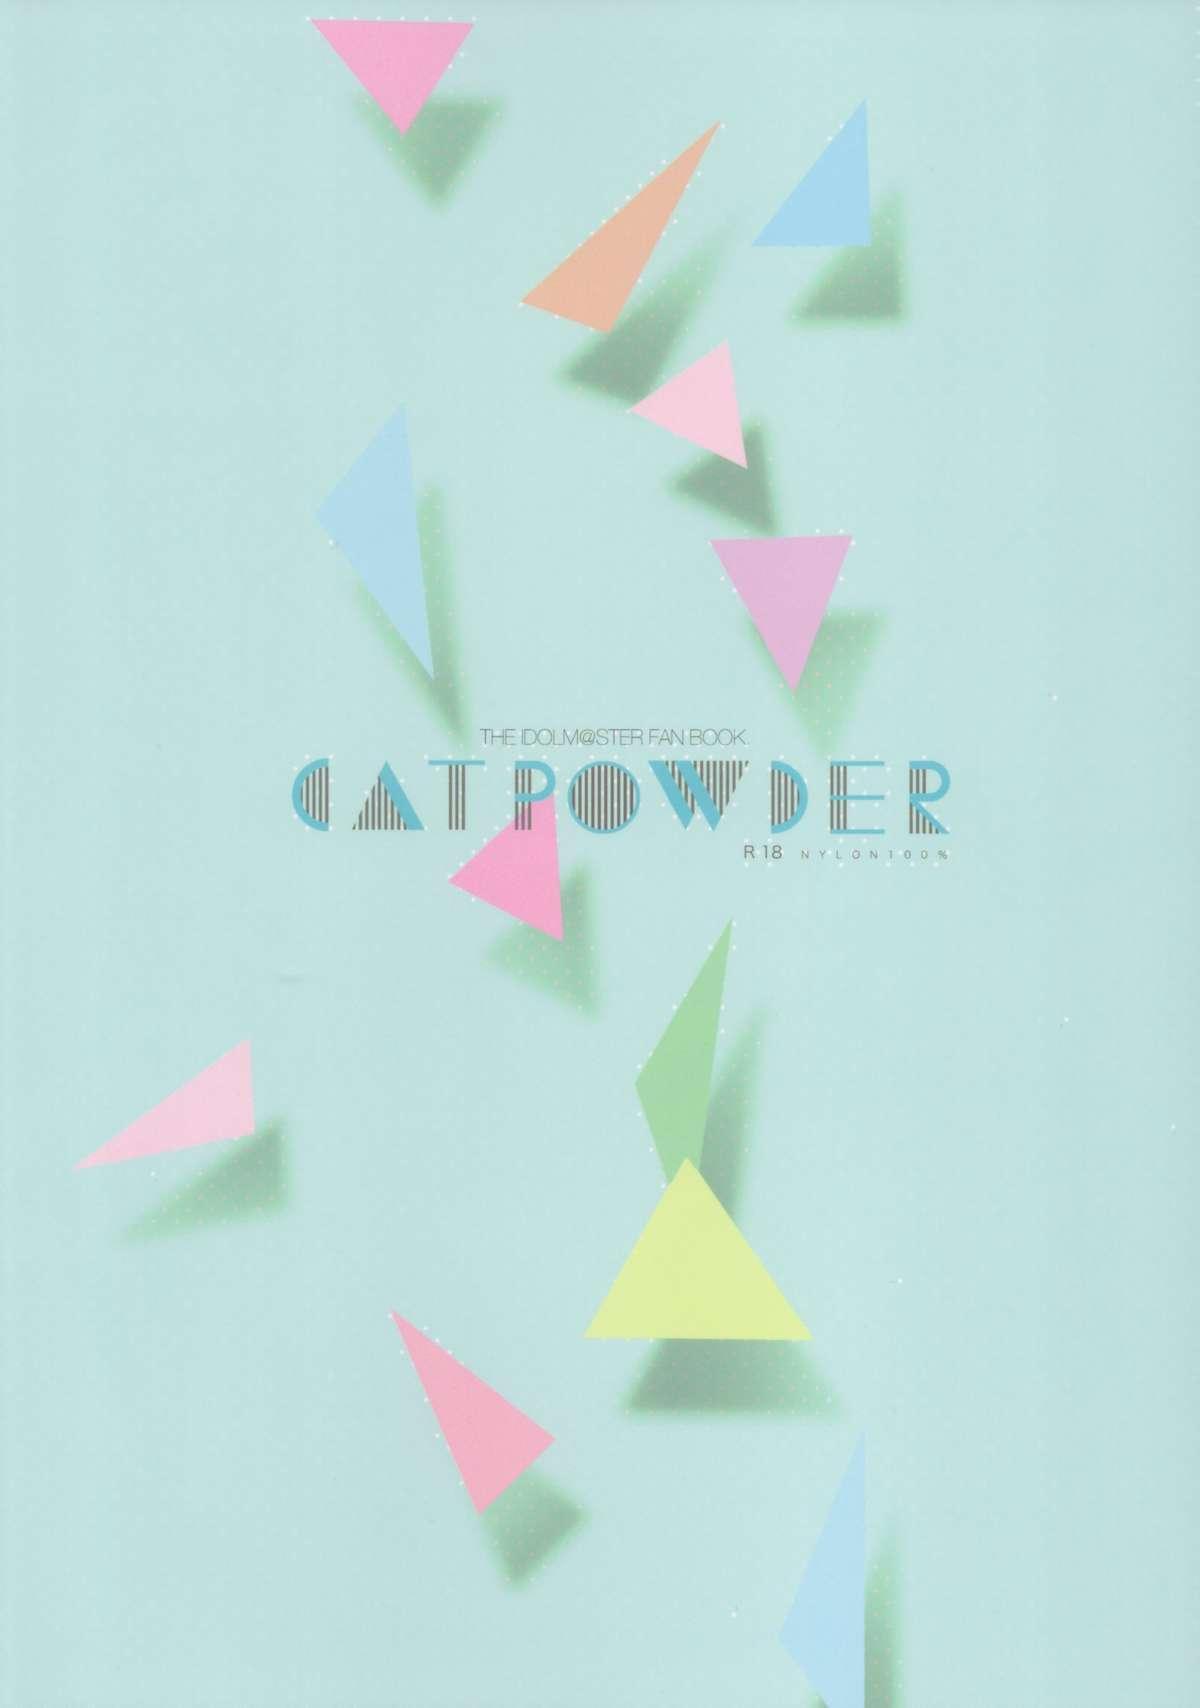 CATPOWDER 1